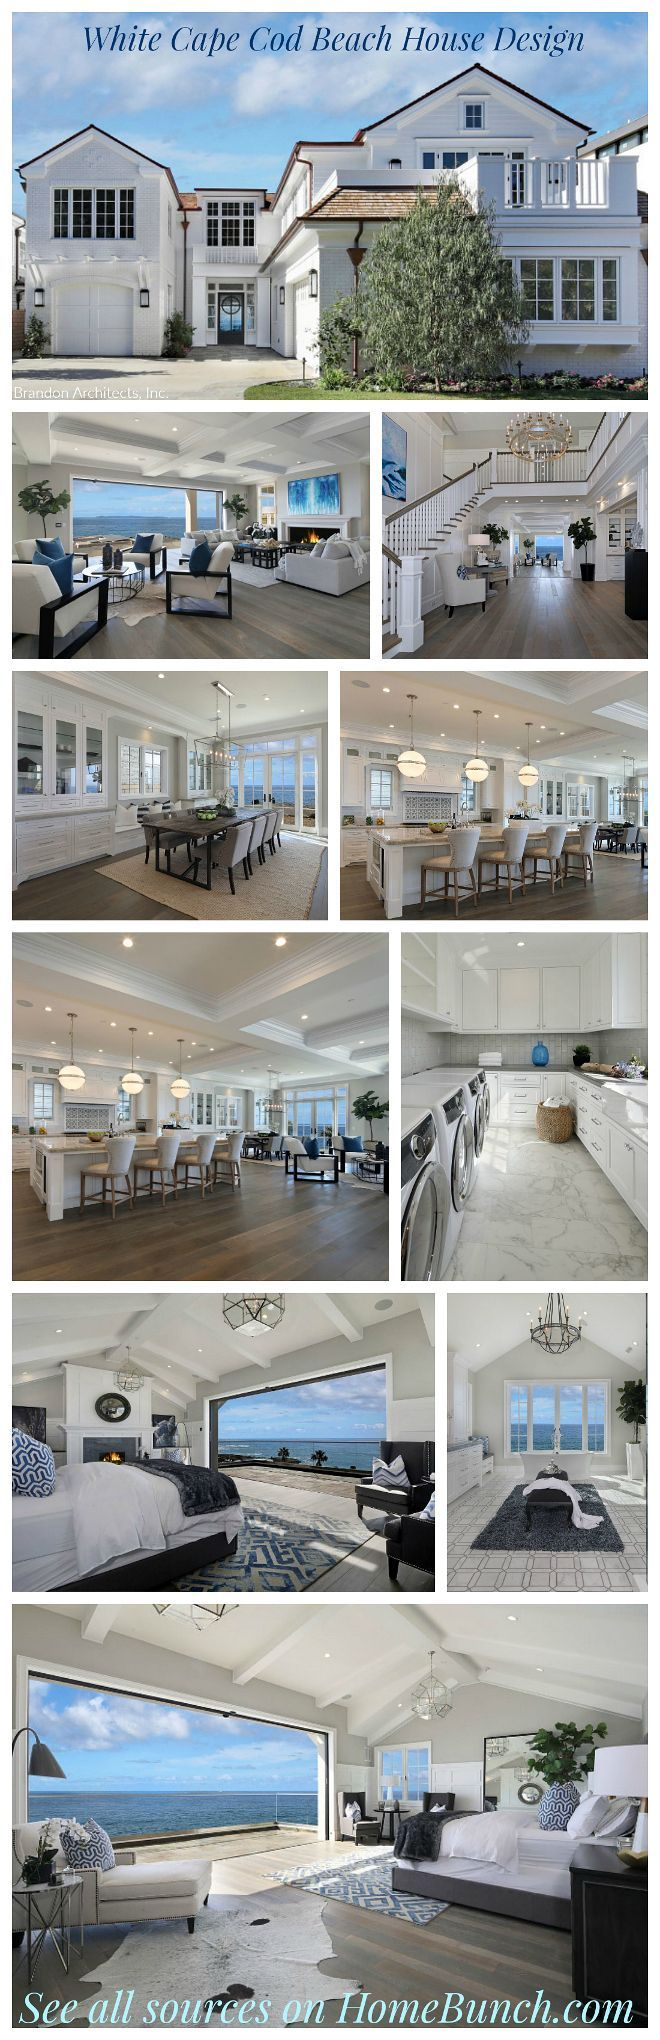 Cape cod house #Cape cod style house (cape cod style) #kitchendesign